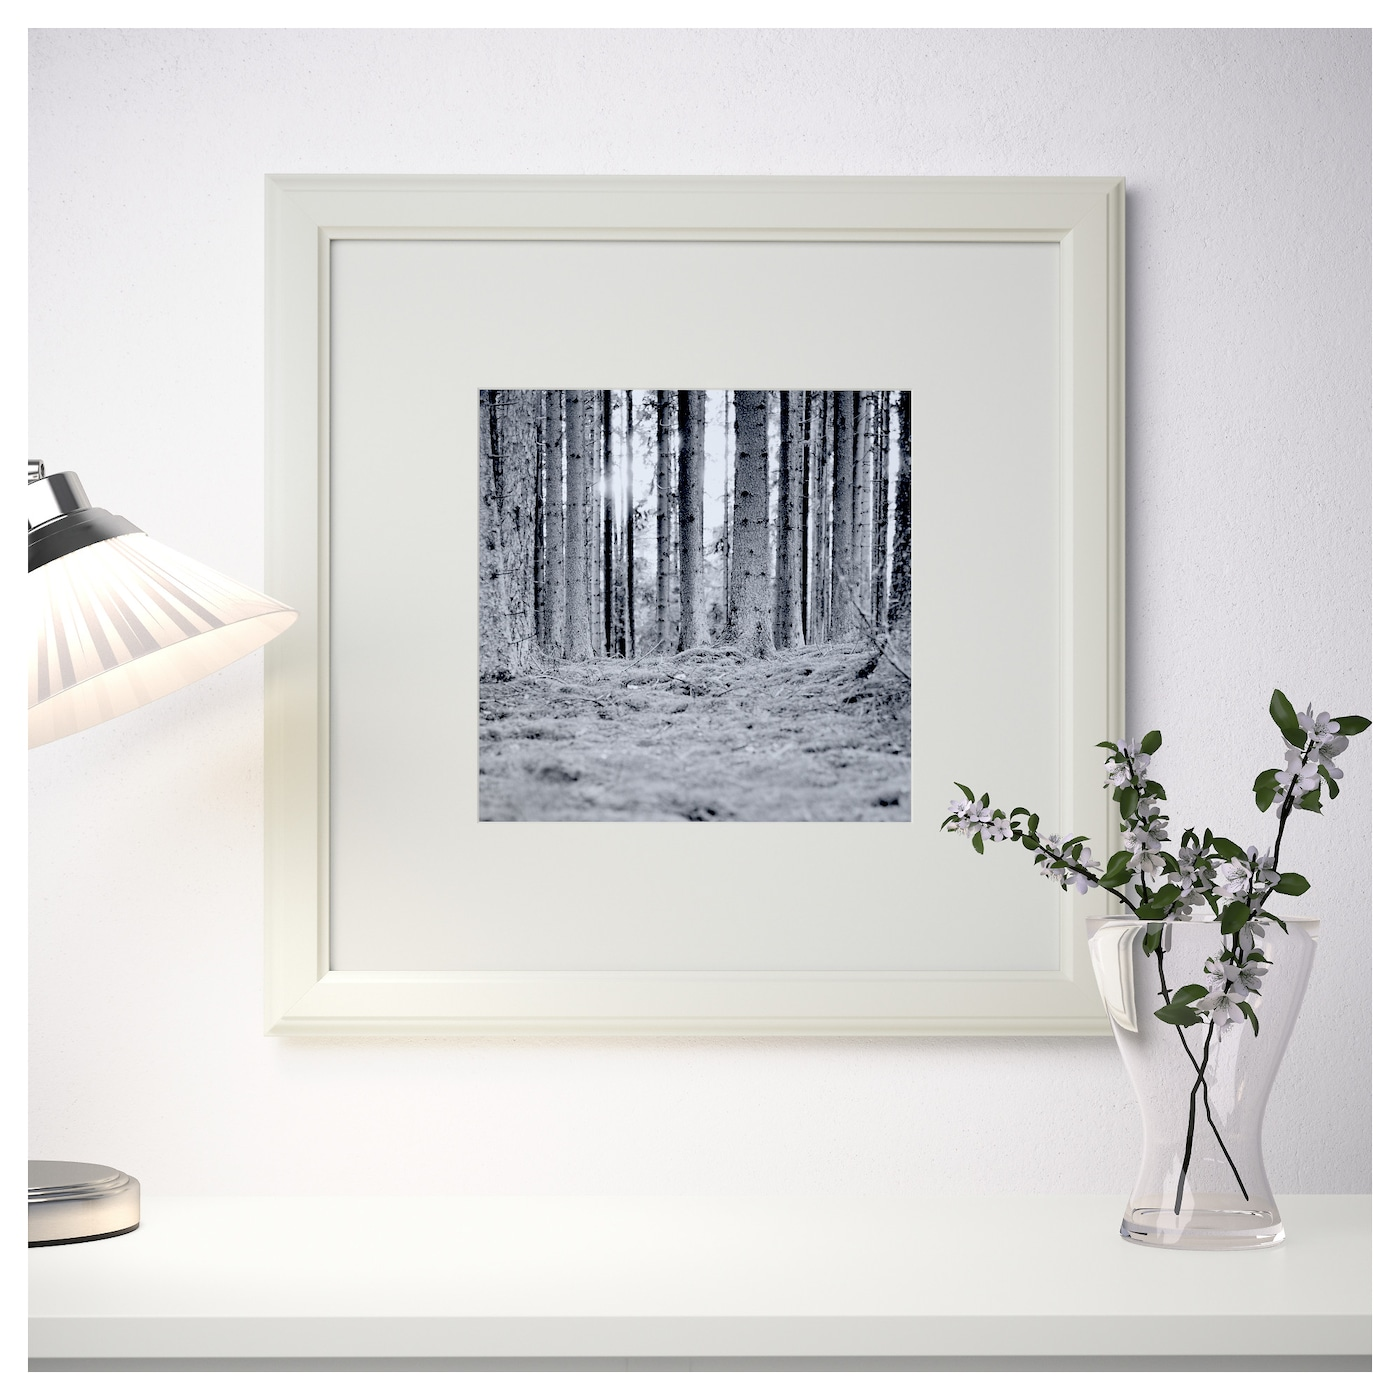 VIRSERUM Frame White 50x50 cm - IKEA